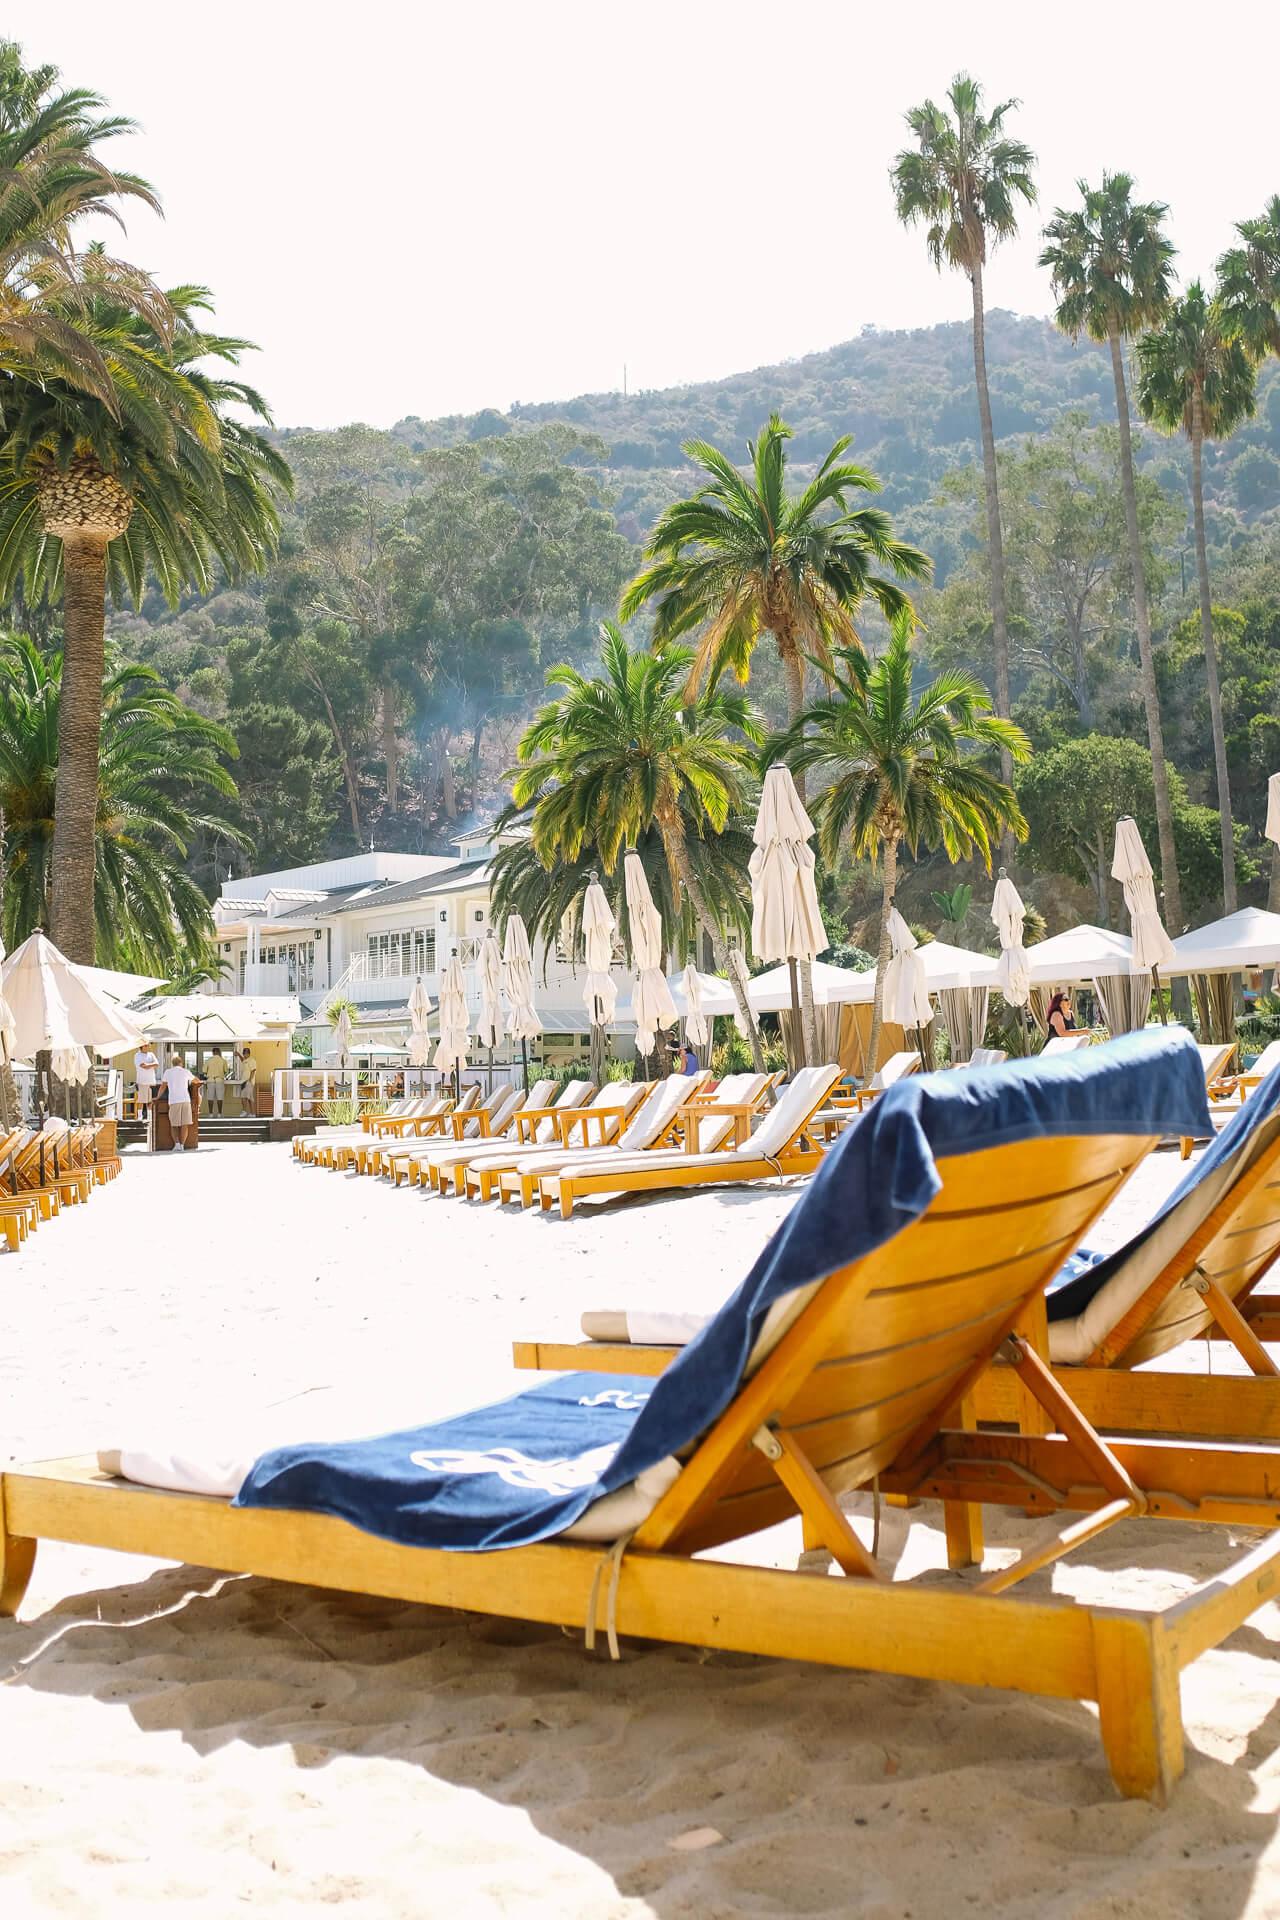 descasno beach club on Catalina Island